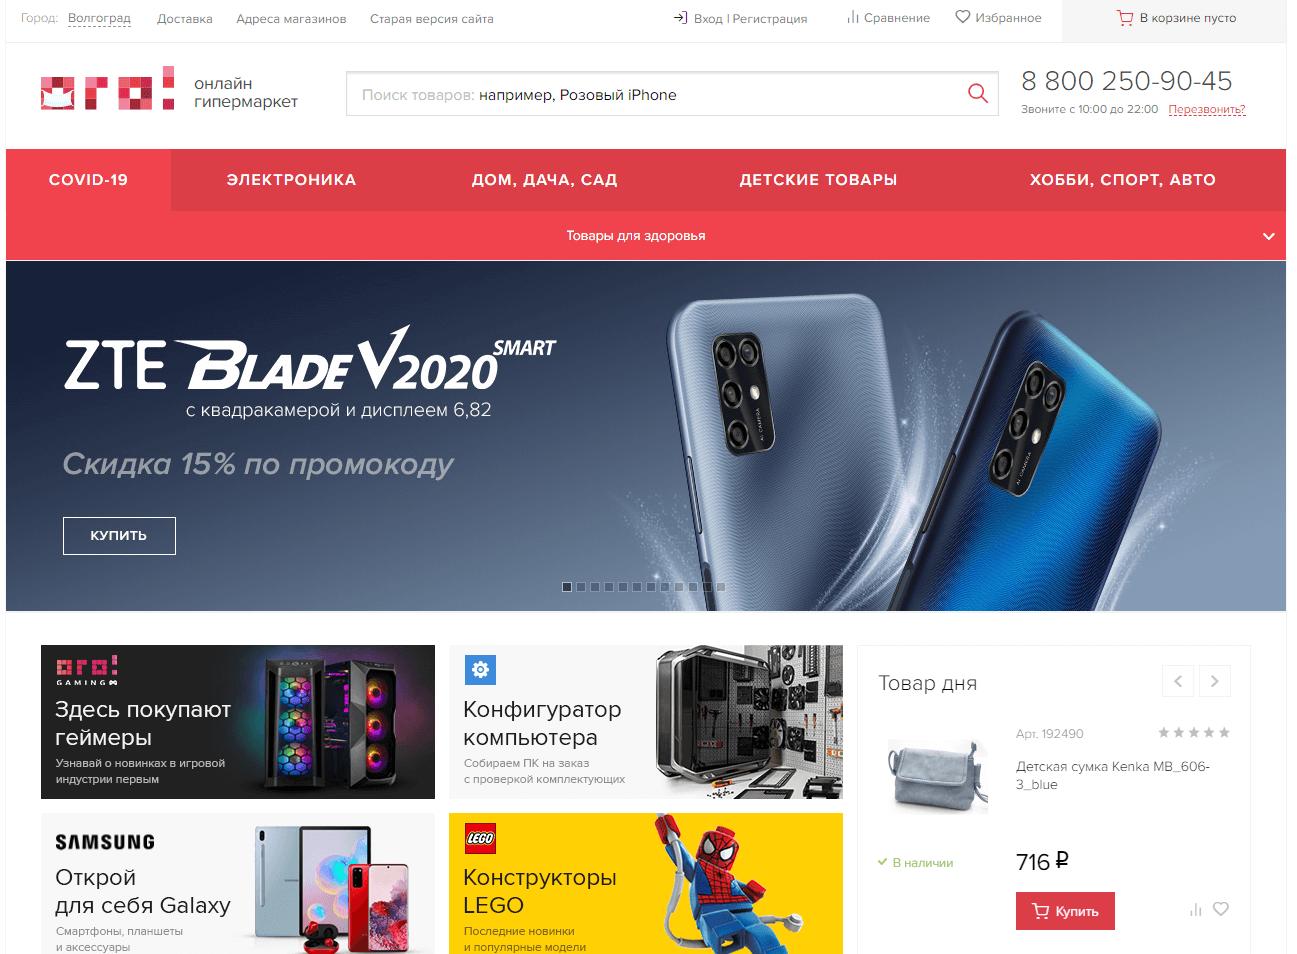 new.ogo1.ru website